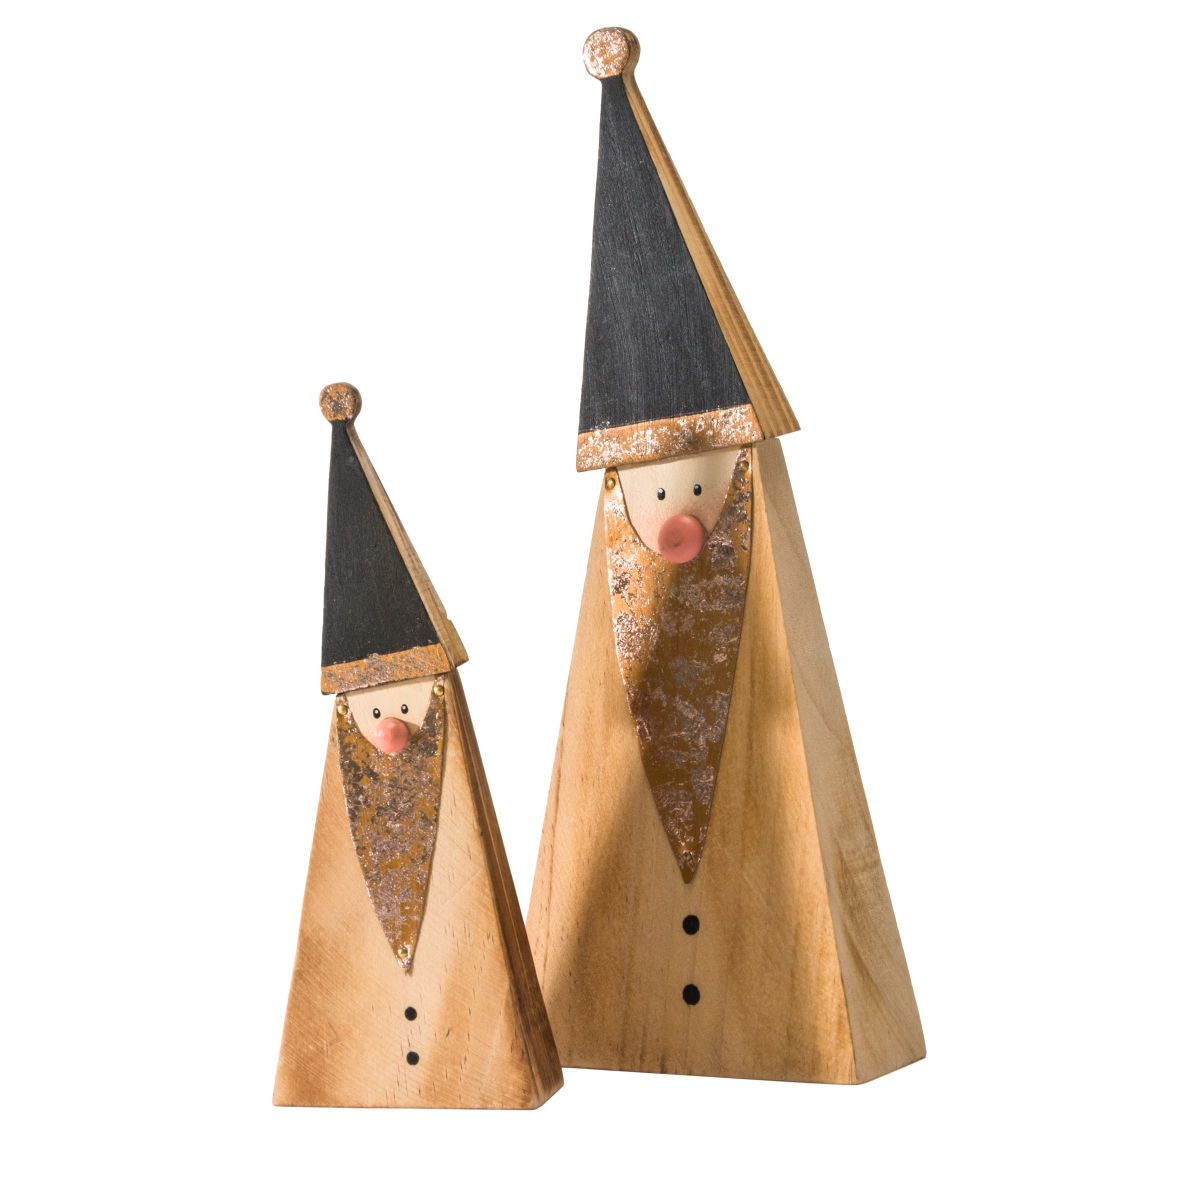 Weihnachtsdeko dekofiguren aus holz moebeldealcom for M bel aus polen bestellen